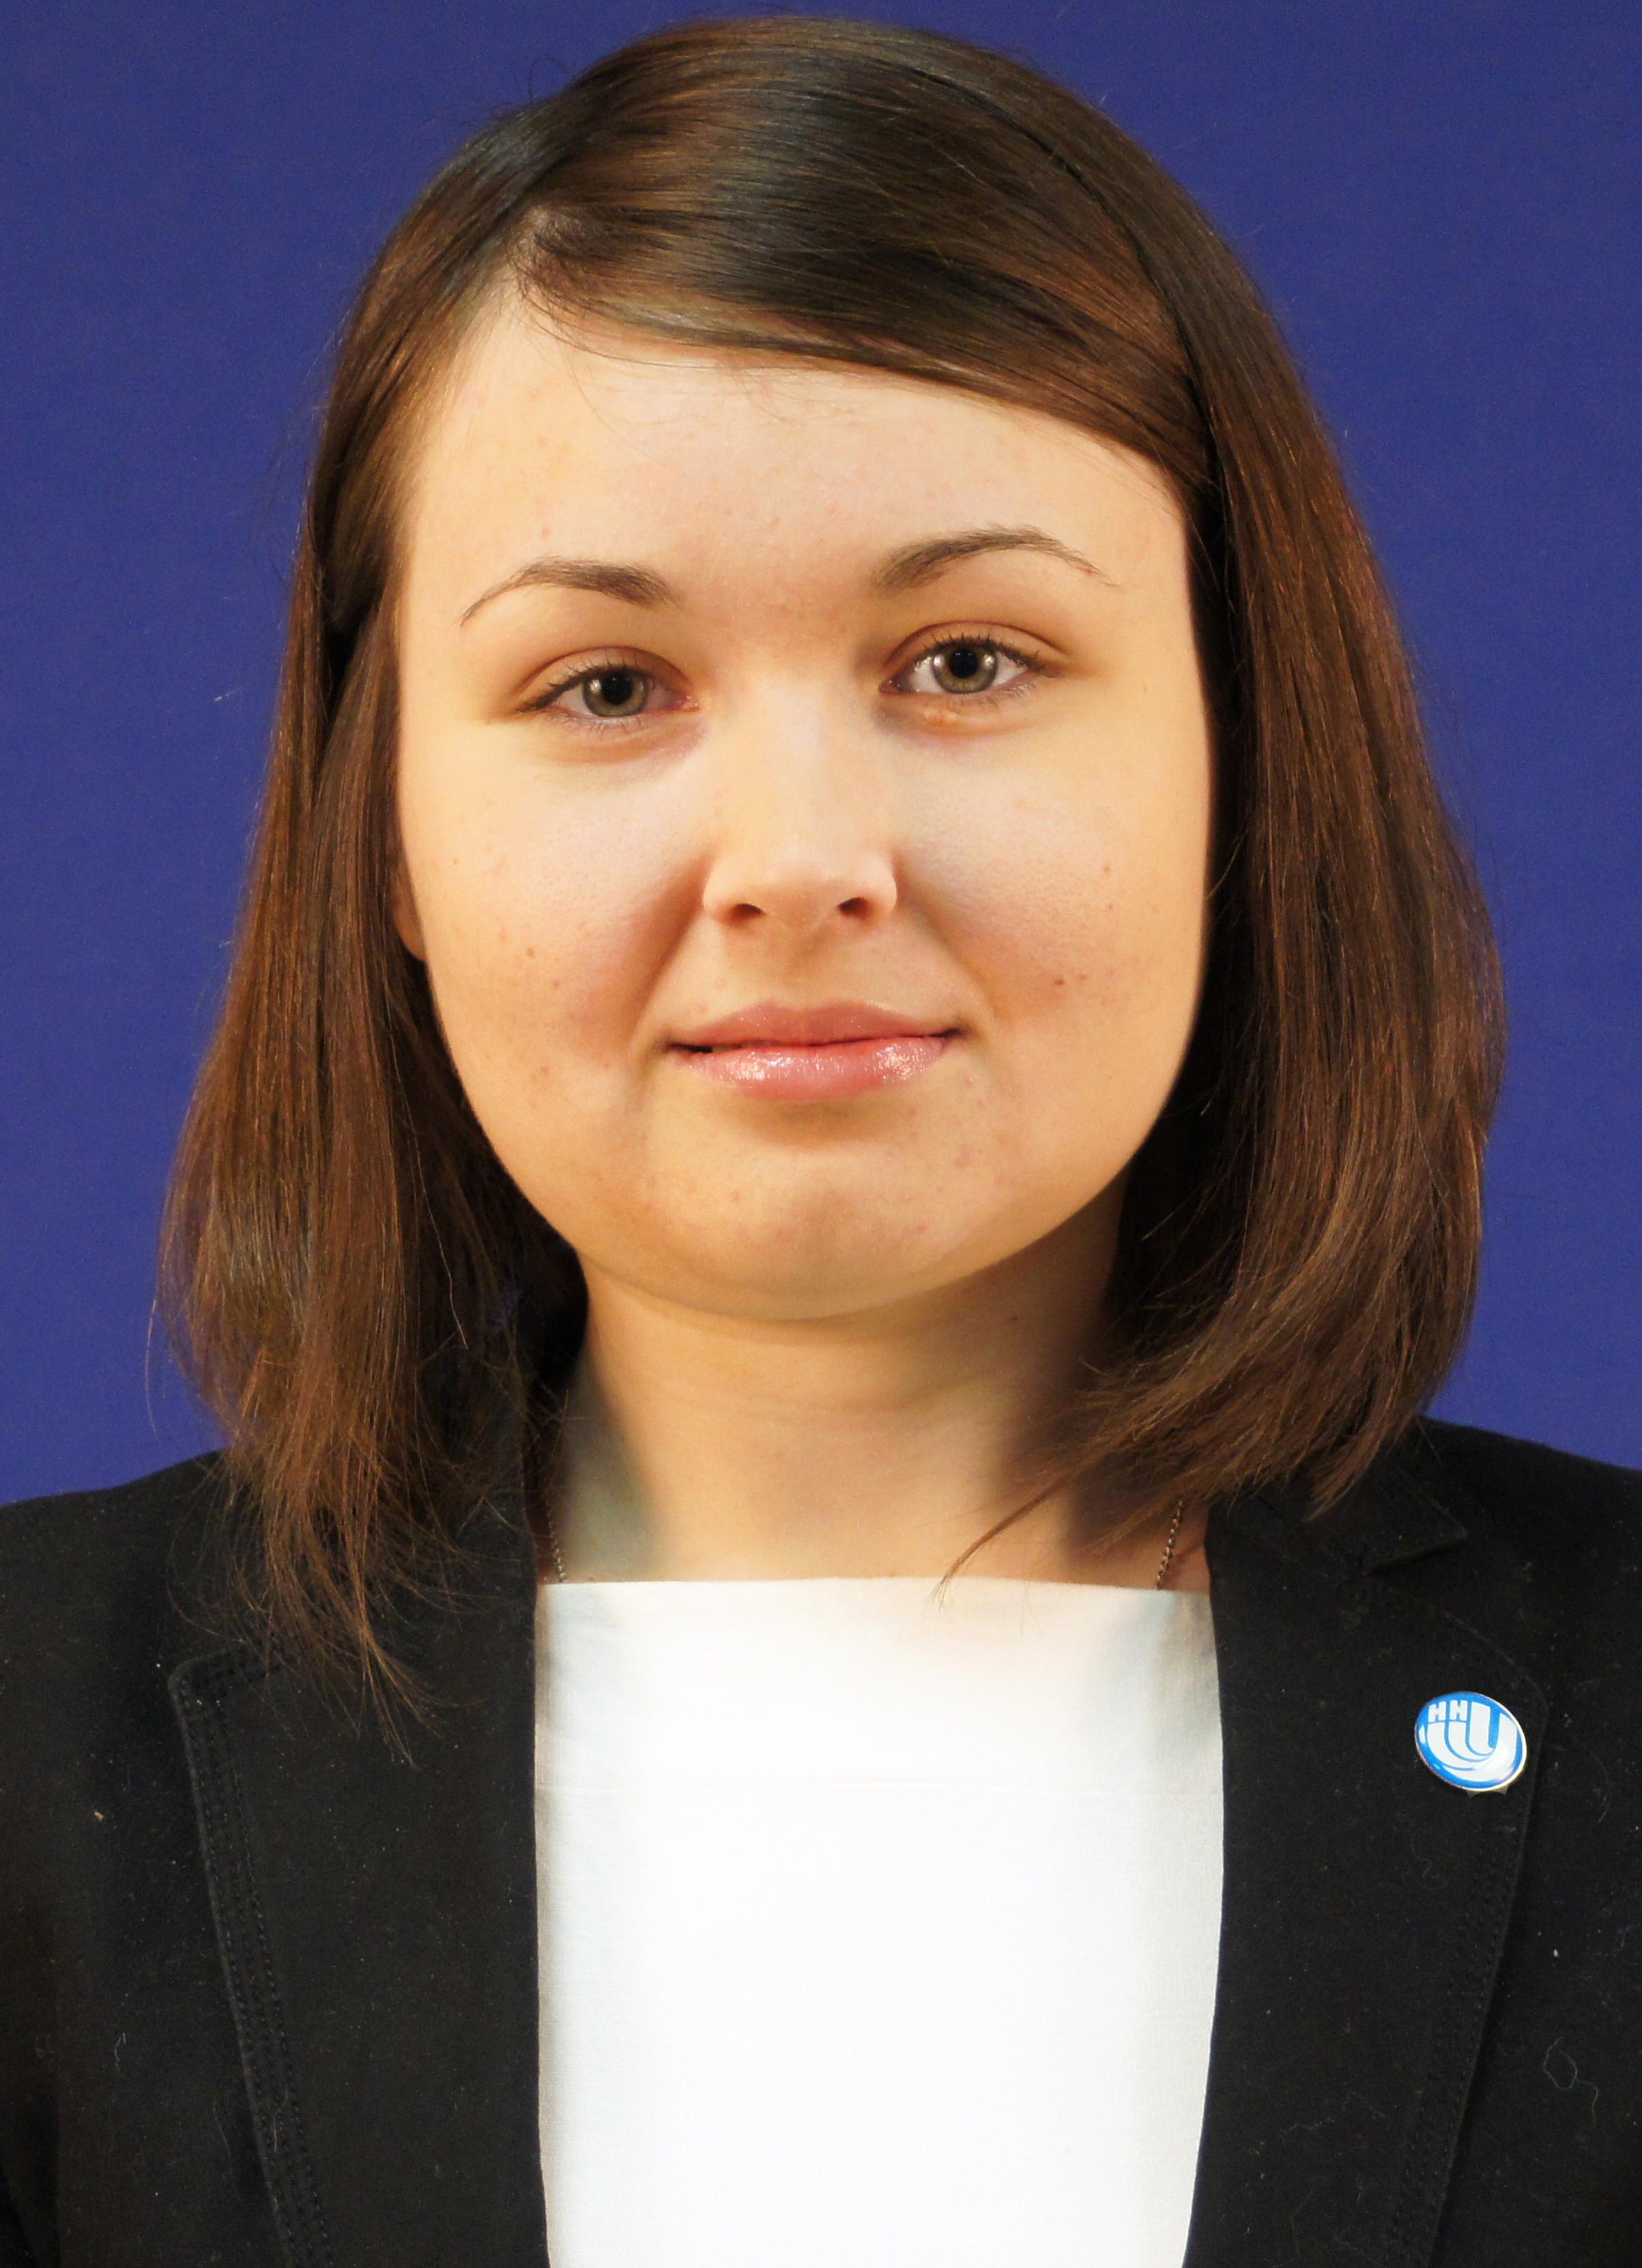 Степанова Полина Андреевна